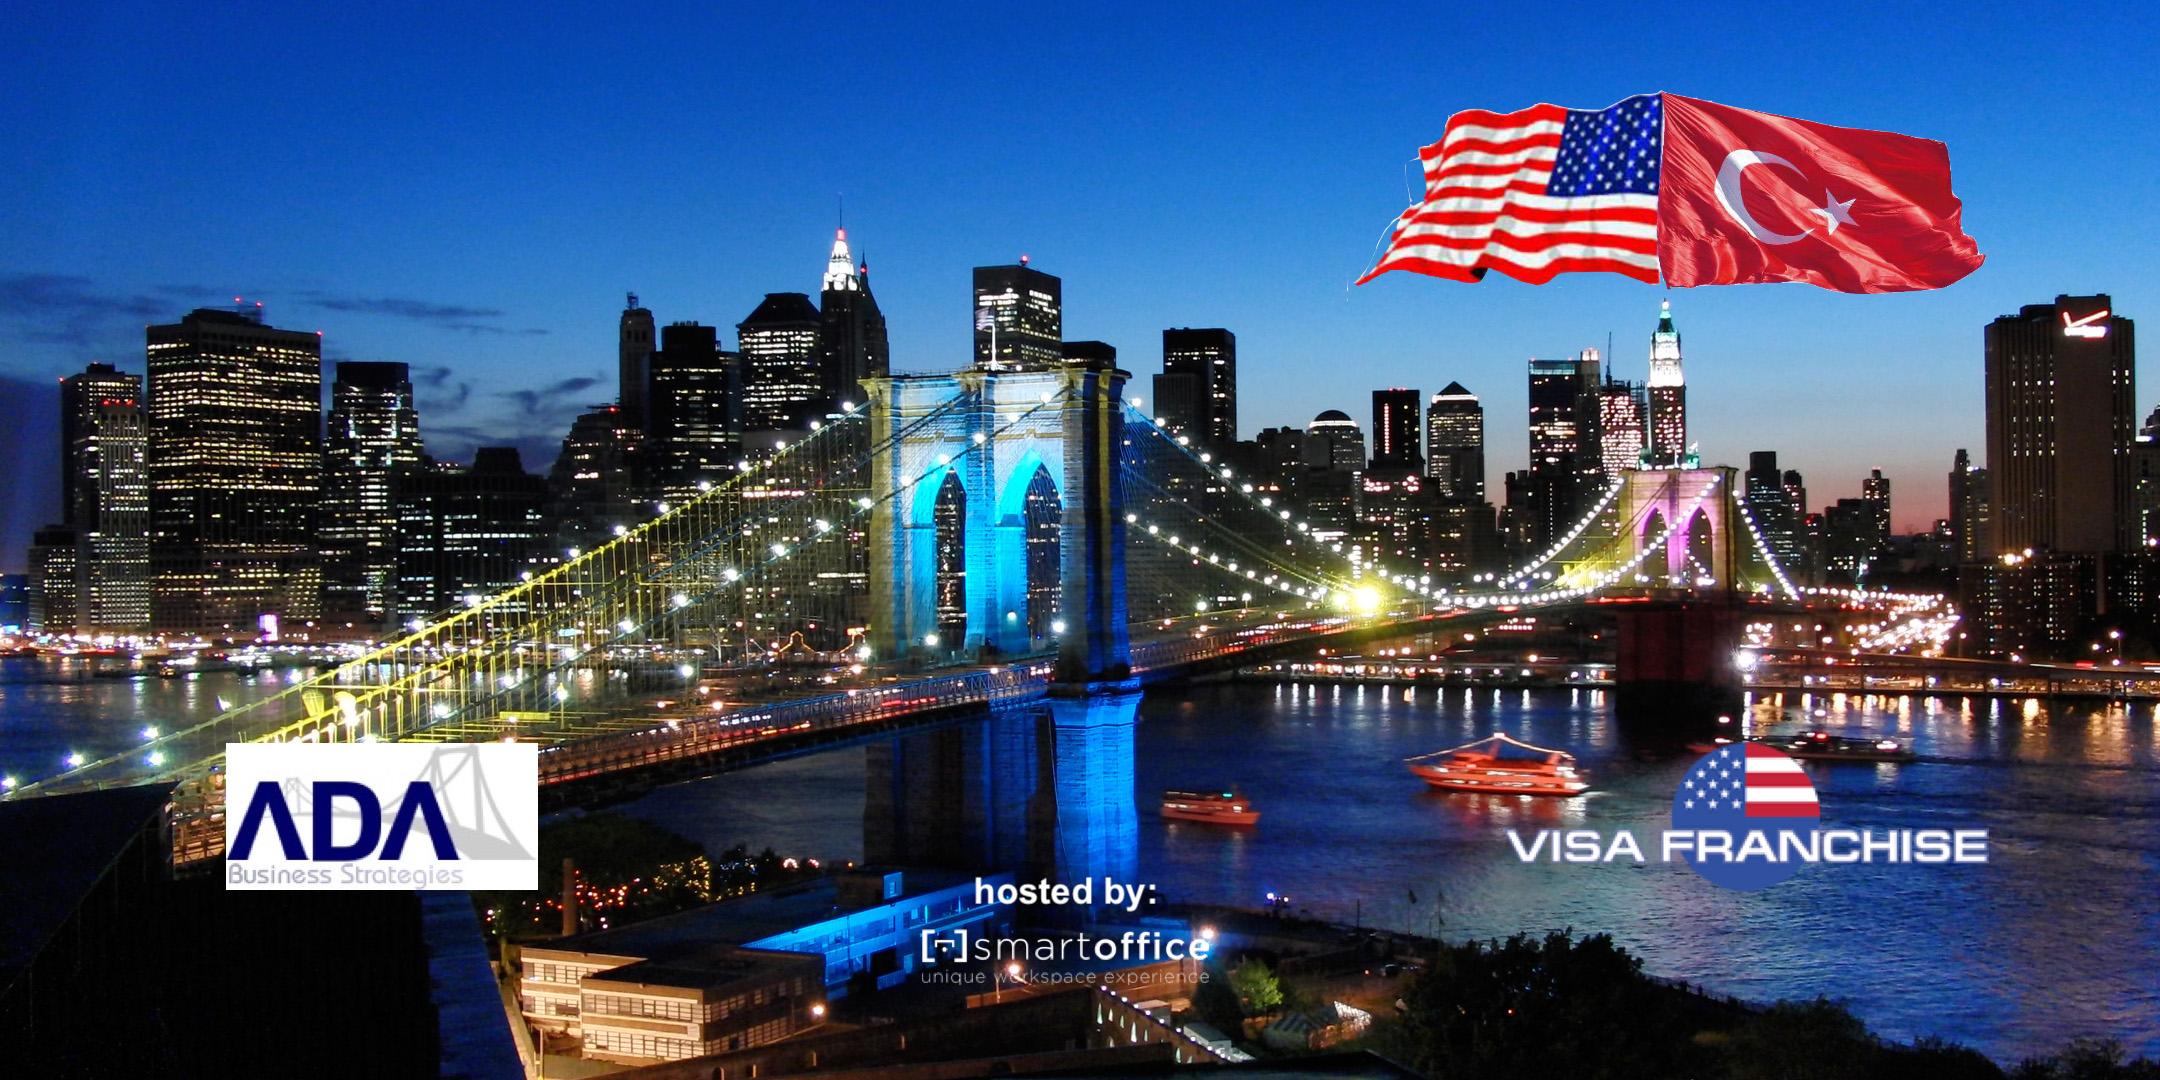 visa-franchise-istanbul-event